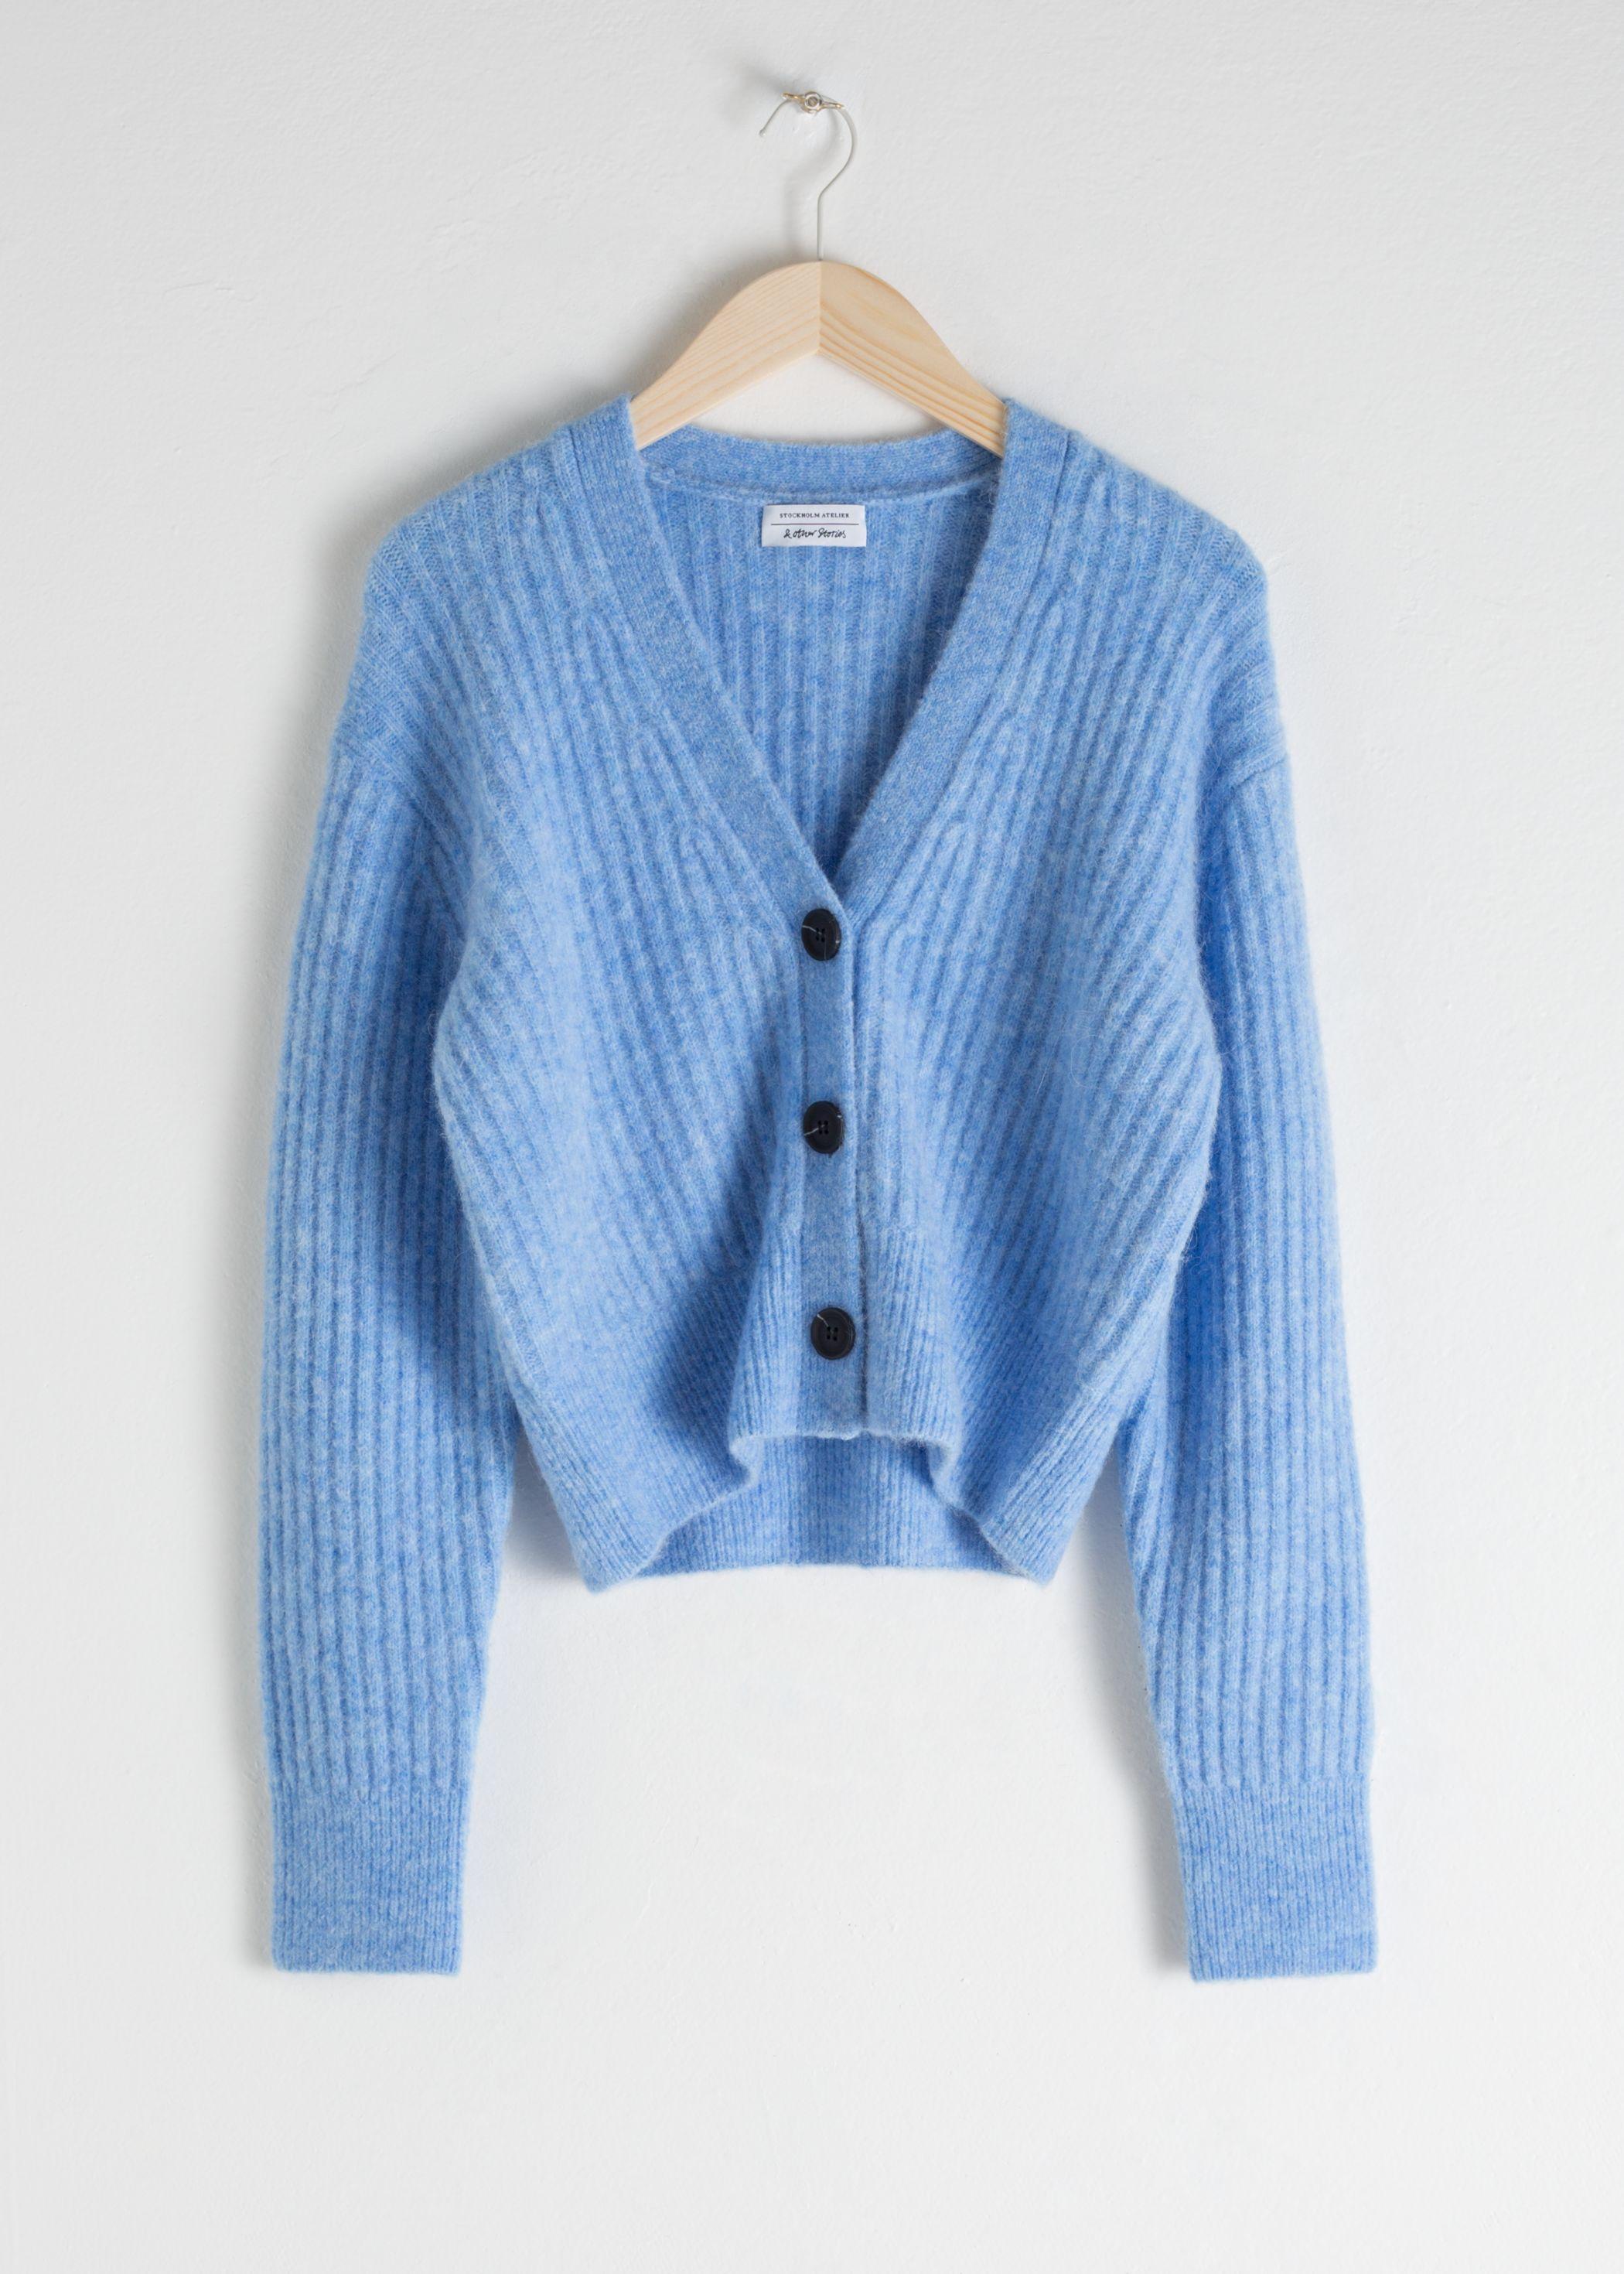 aae42d4a4 Wool Blend Cardigan